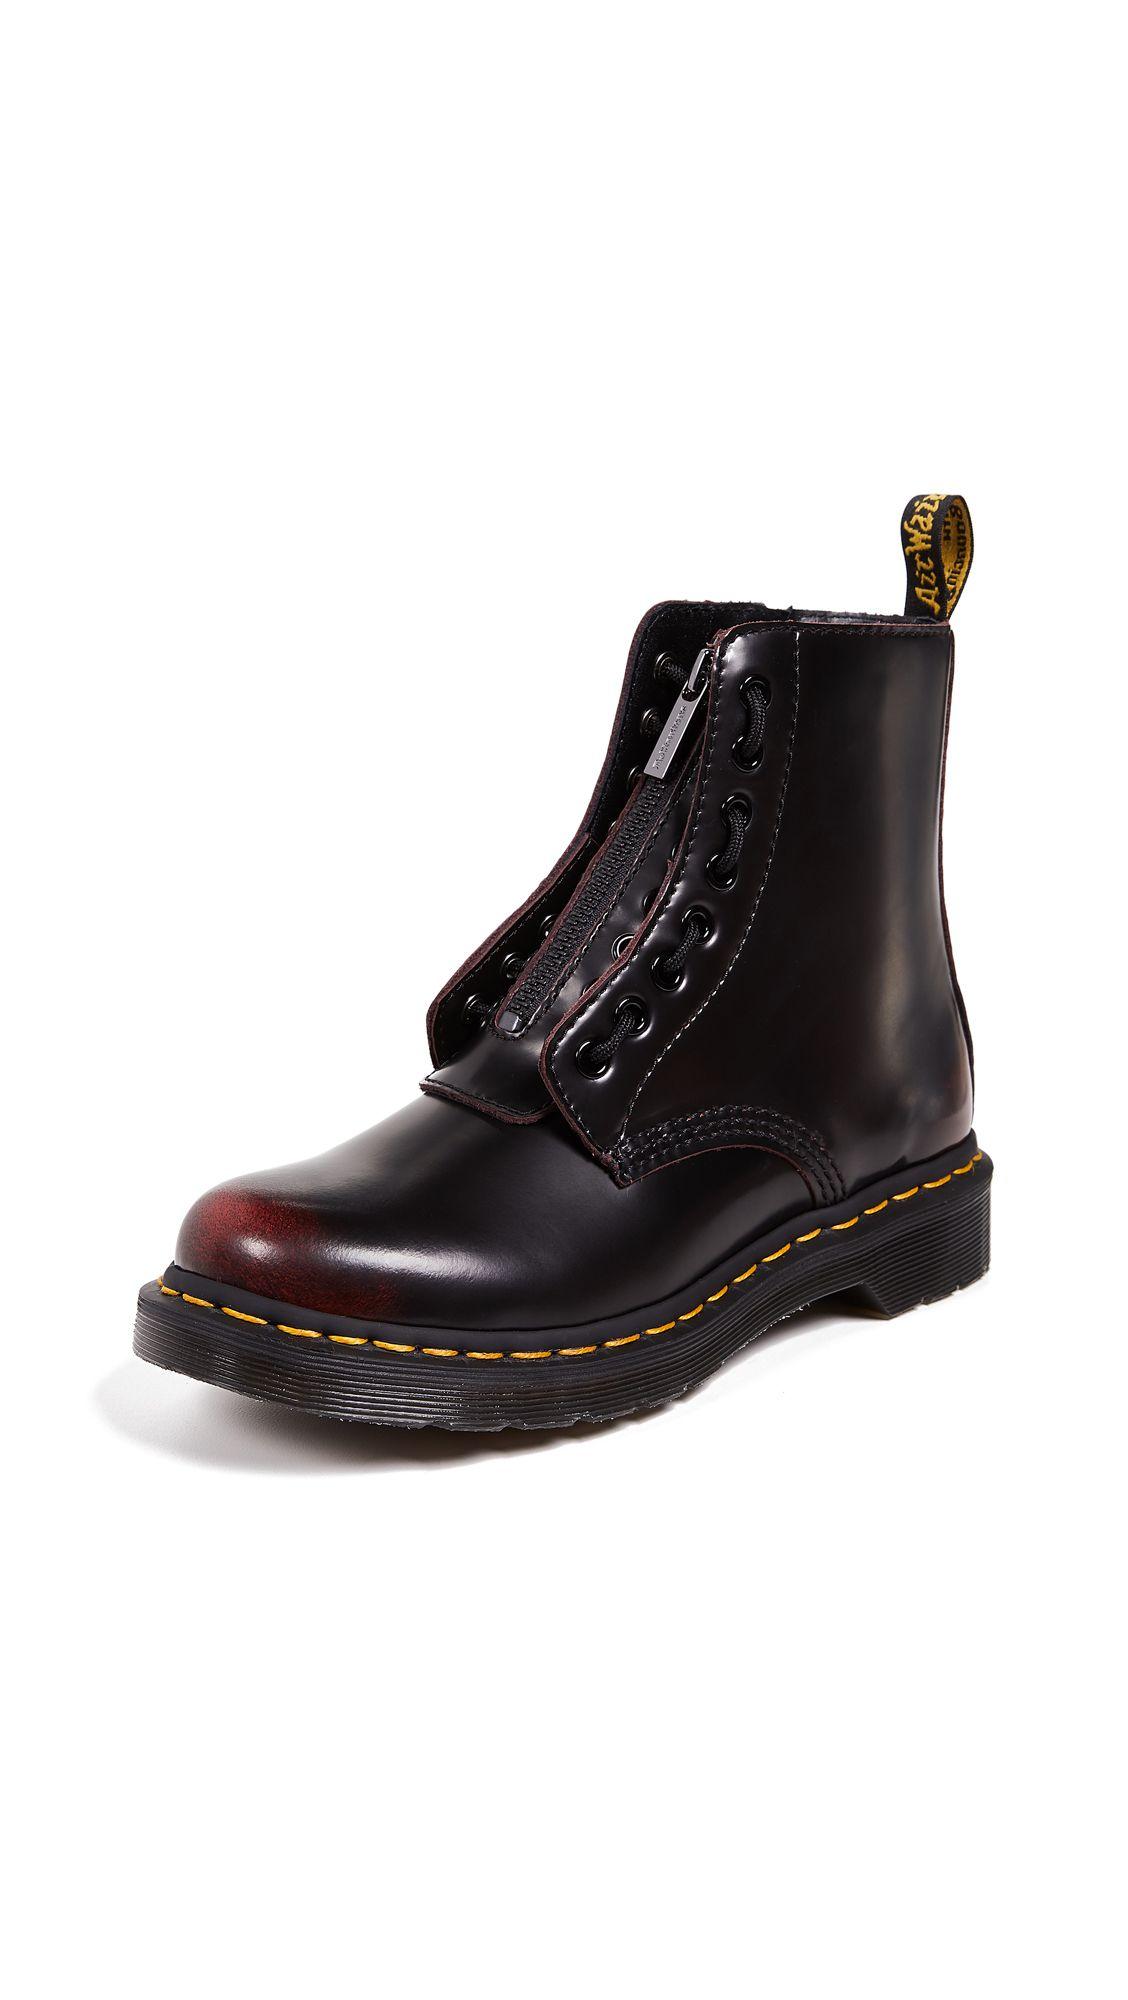 b7af906892e89 Shop DR. MARTENS 1460 PASCAL FRONT ZIP 8 EYE BOOTS